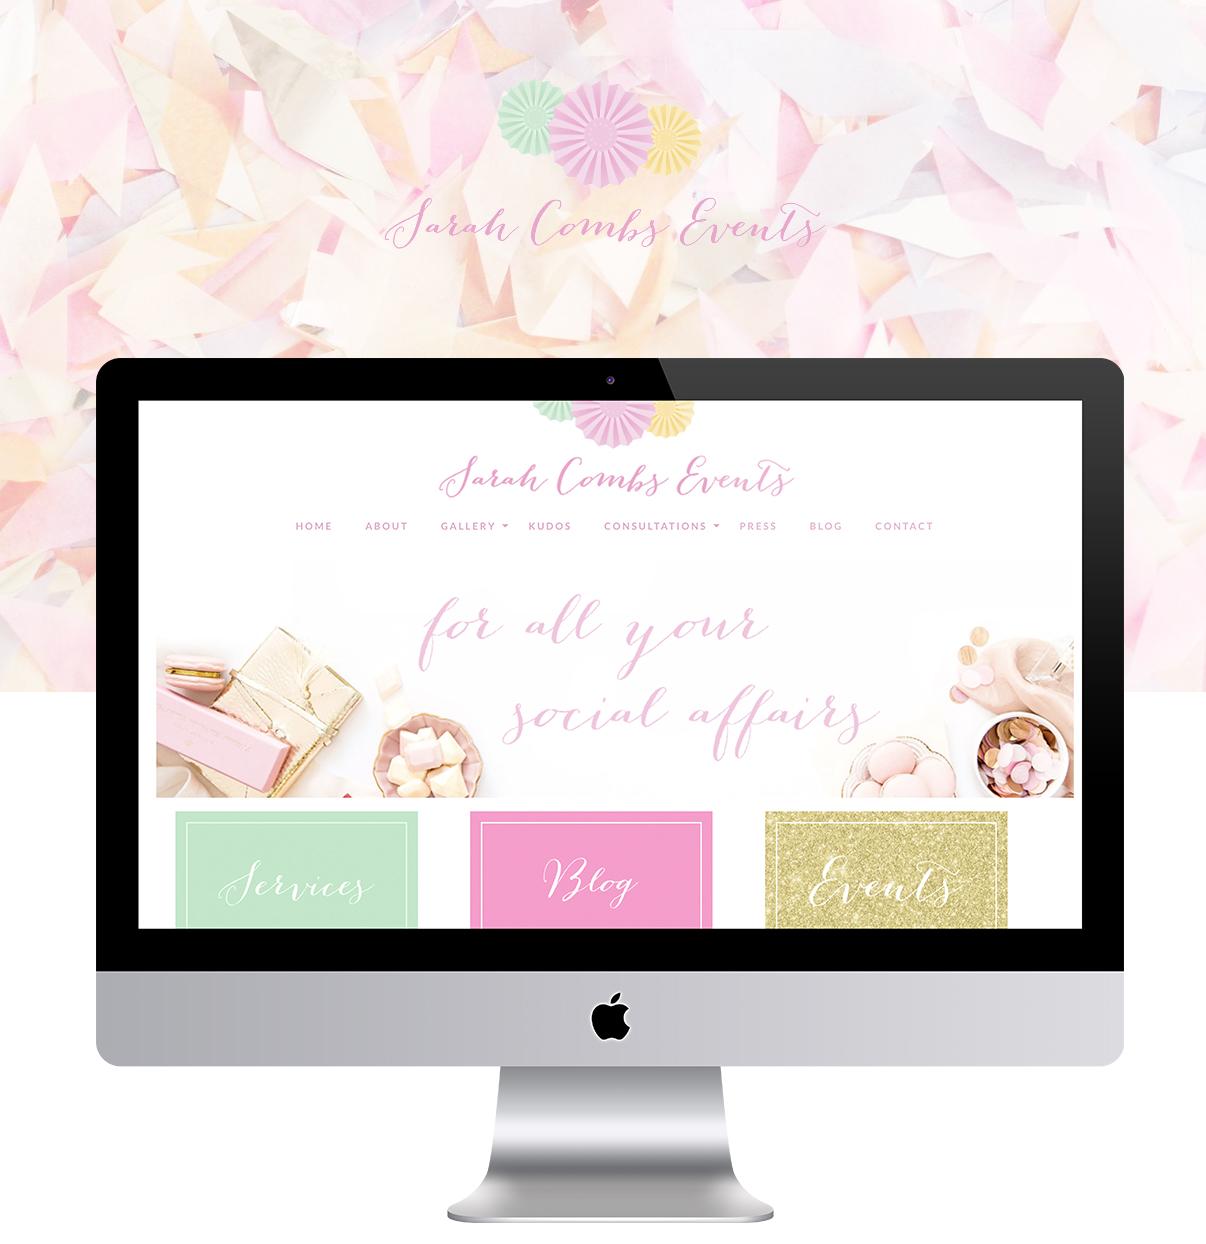 Sarah Combs Events - Beautiful, Feminine, Modern Website Design